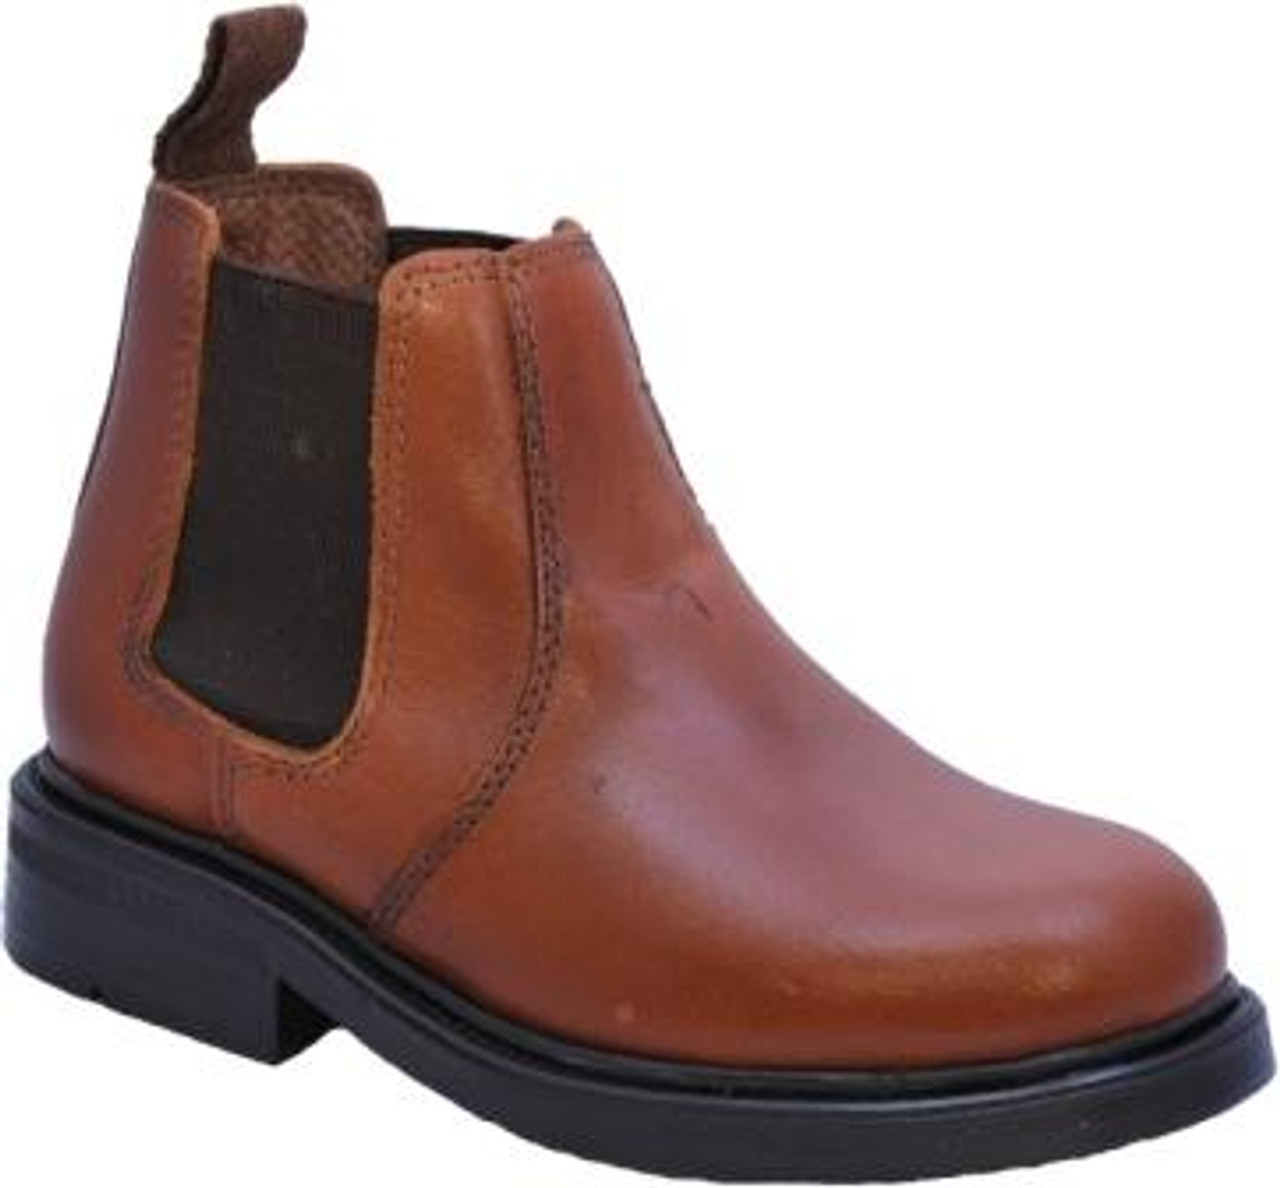 Oaktrak Walton Kids Dealer Boot Tan